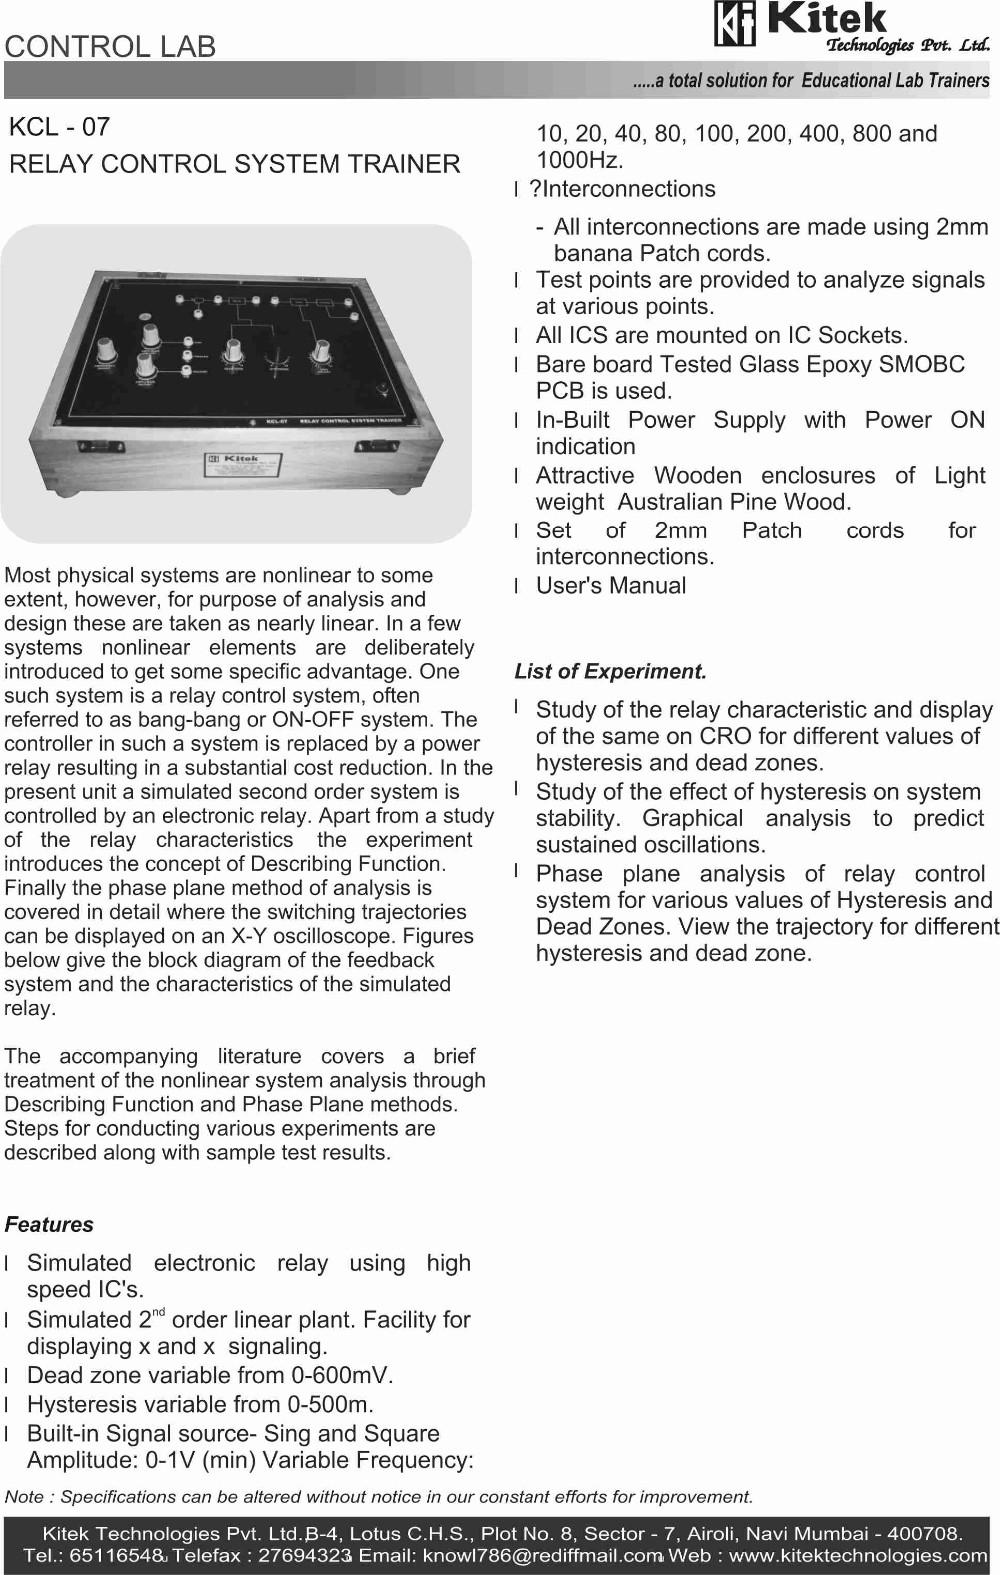 DC MOTOR SPEED CONTROL TRAINER KIT / CONTROL LAB TRAINER